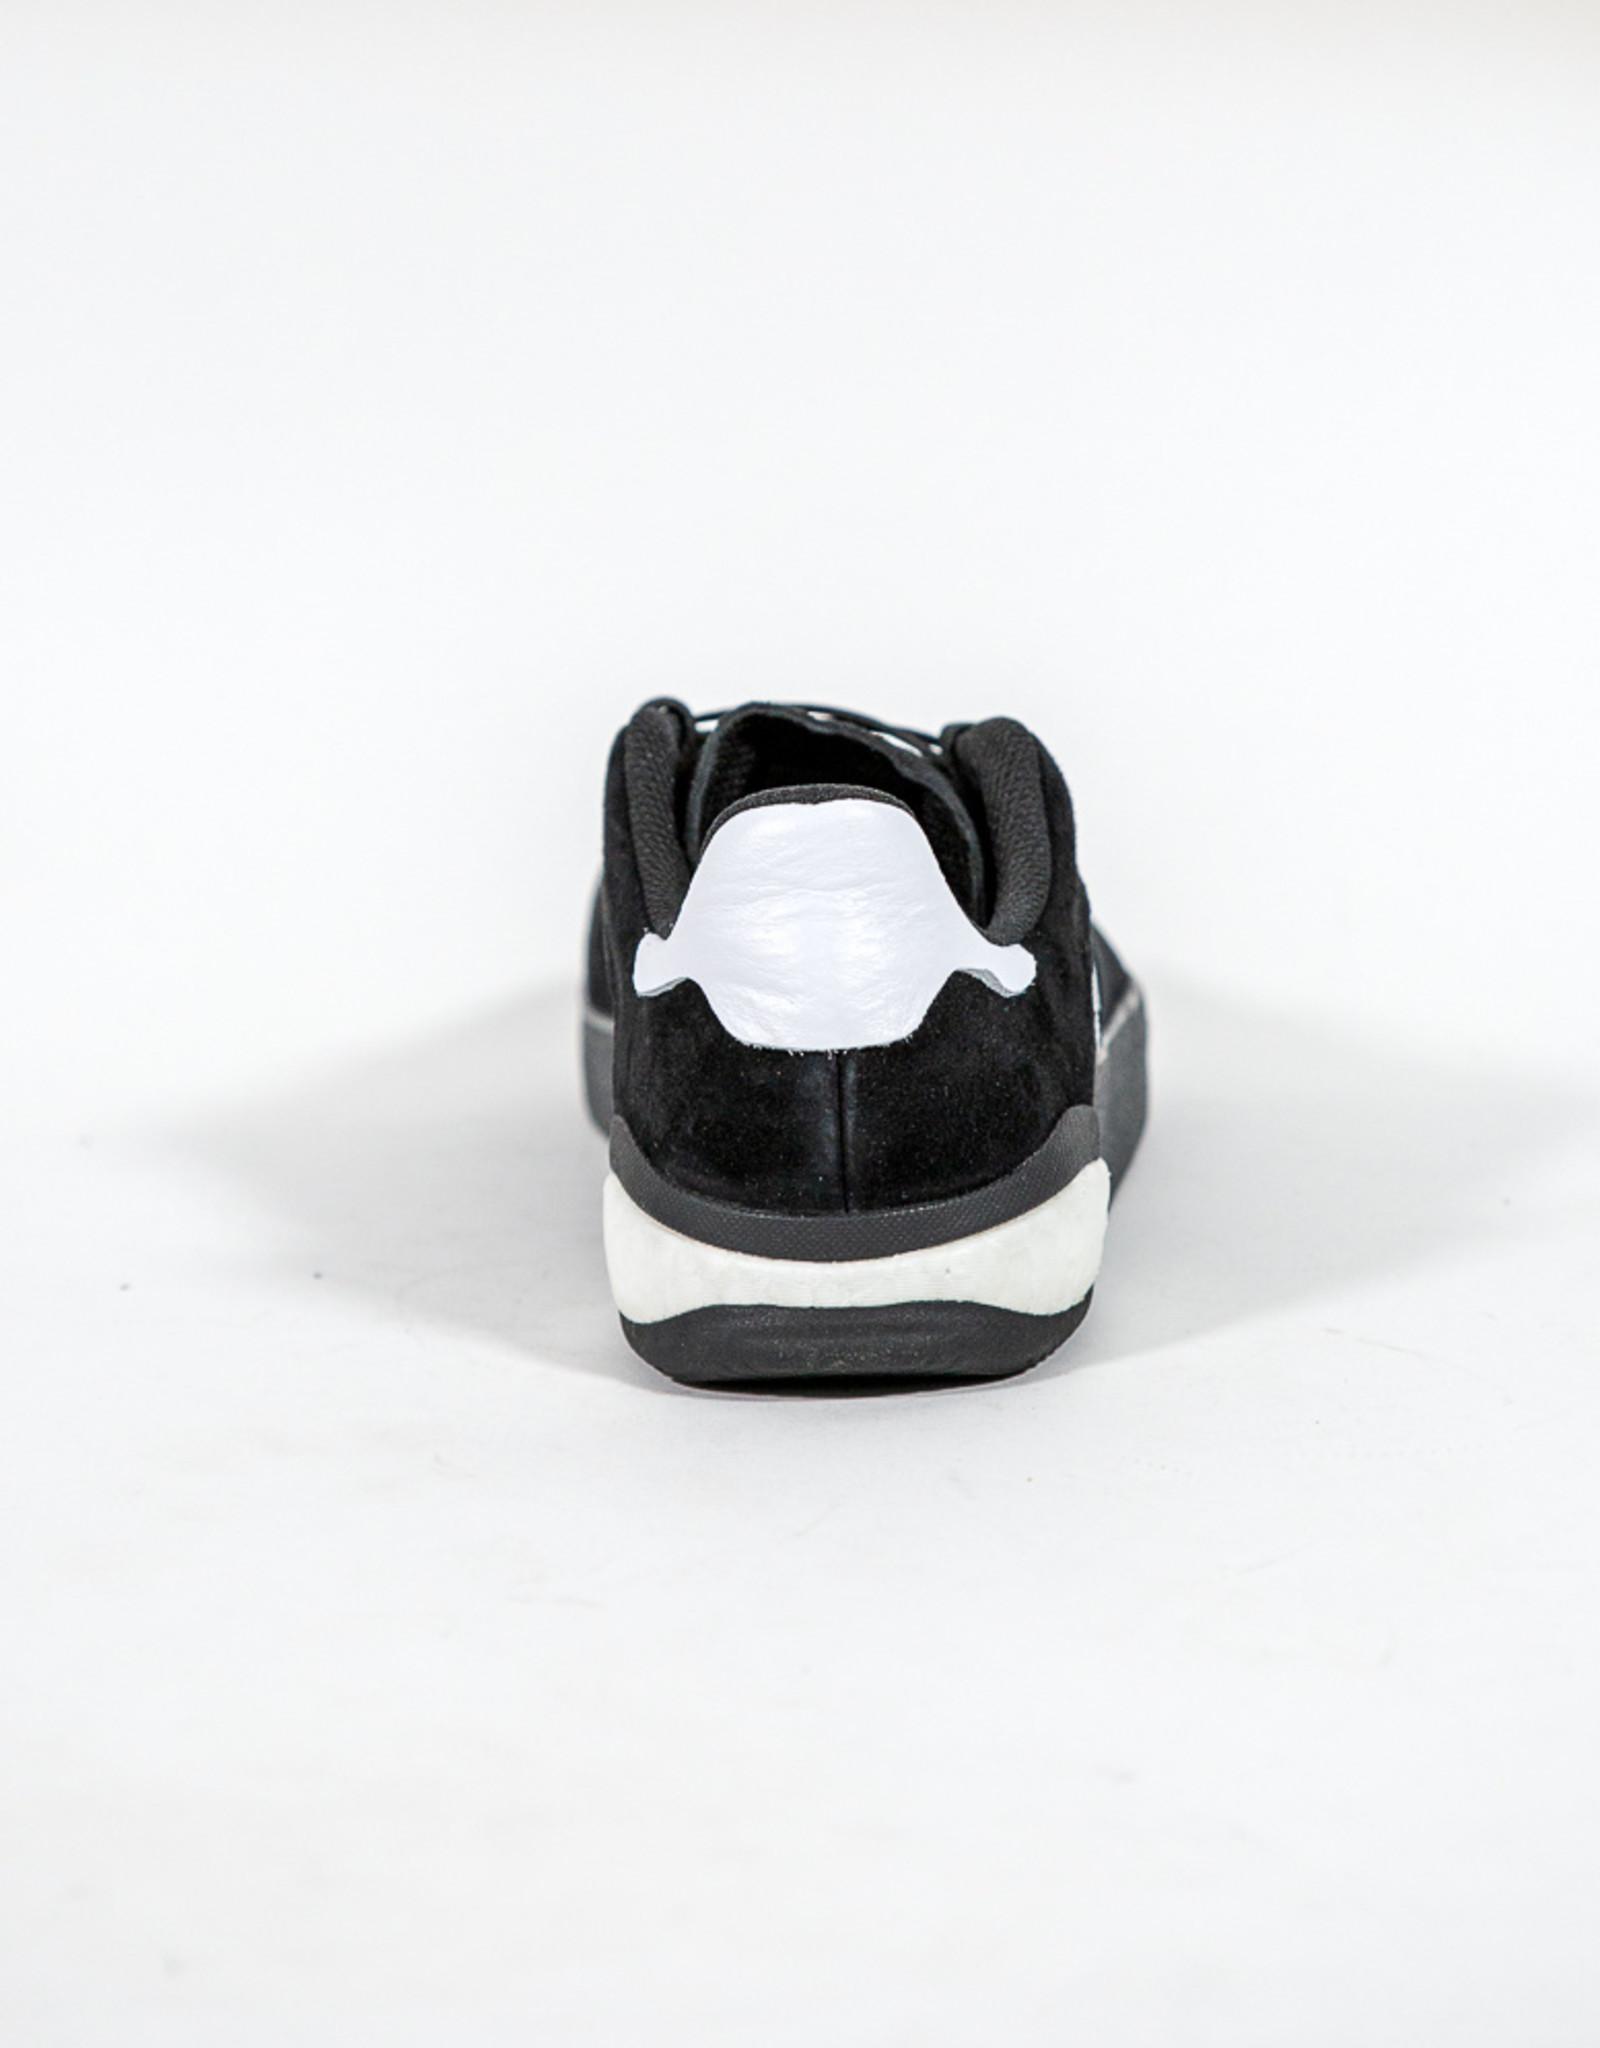 ADIDAS ADIDAS 3ST.004 - CORE BLACK/WHITE